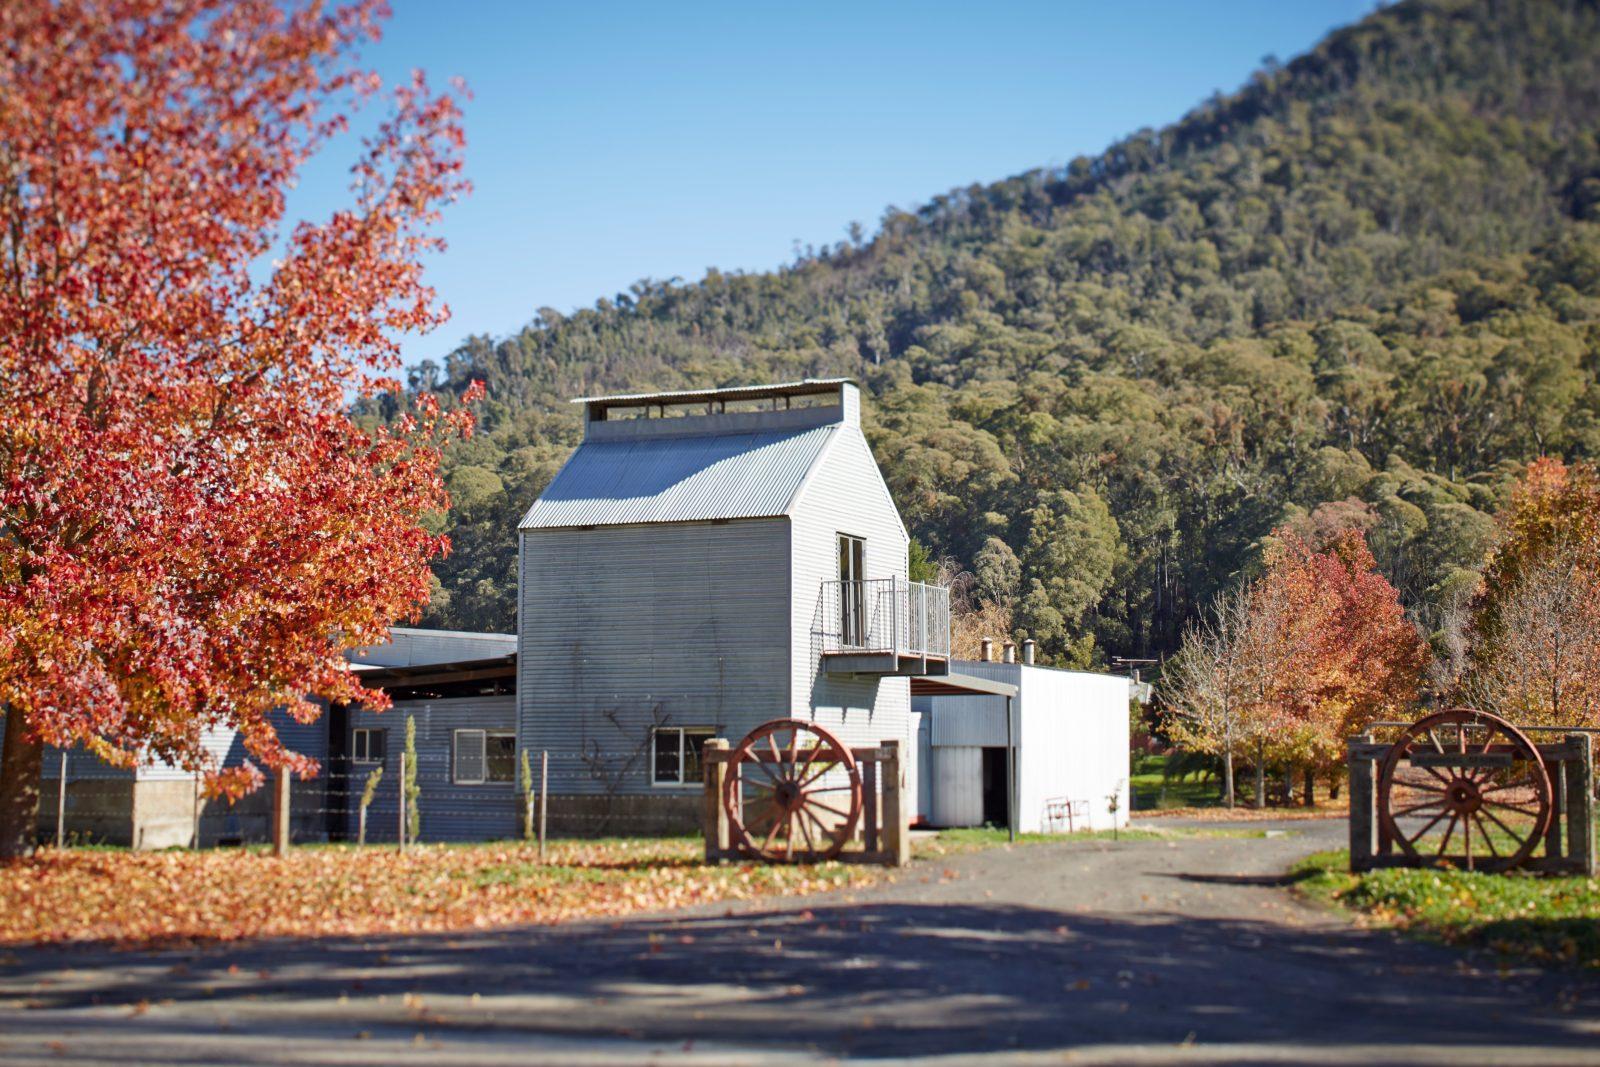 King Valley Kiln - Glenmore Springs Accommodation